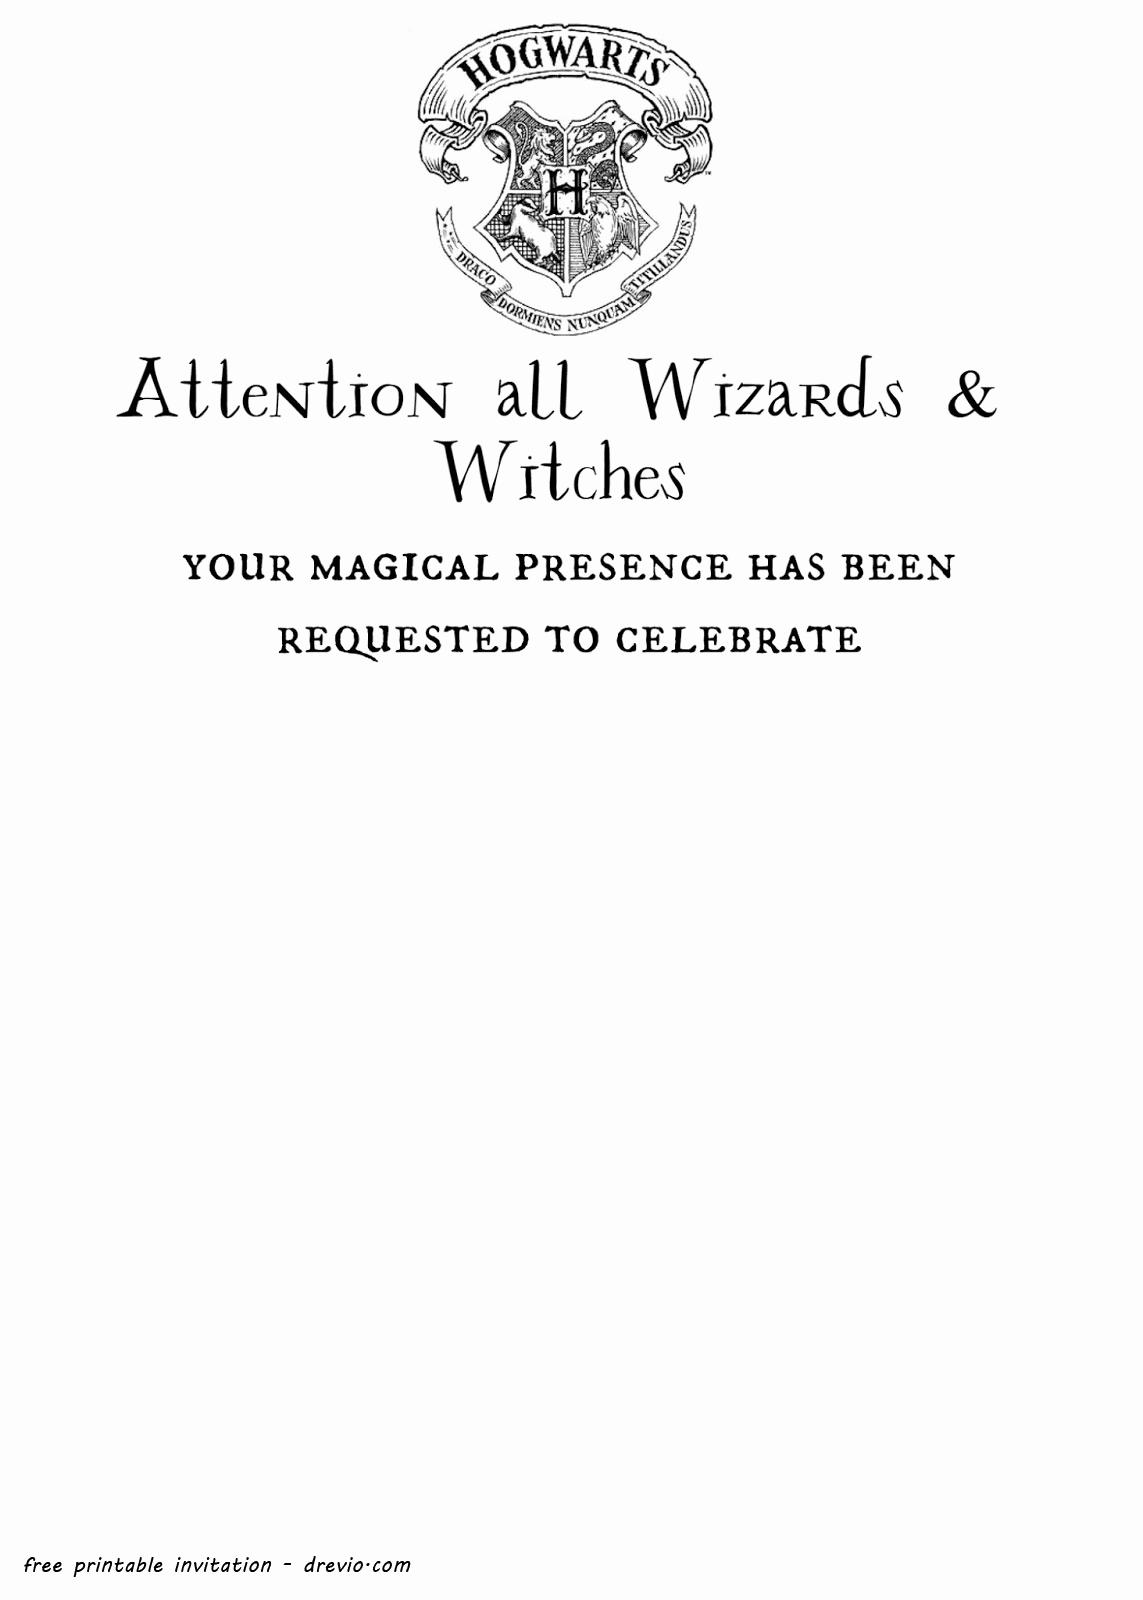 Free Printable Invitation Templates New Free Printable Harry Potter Hogwarts Invitation Template